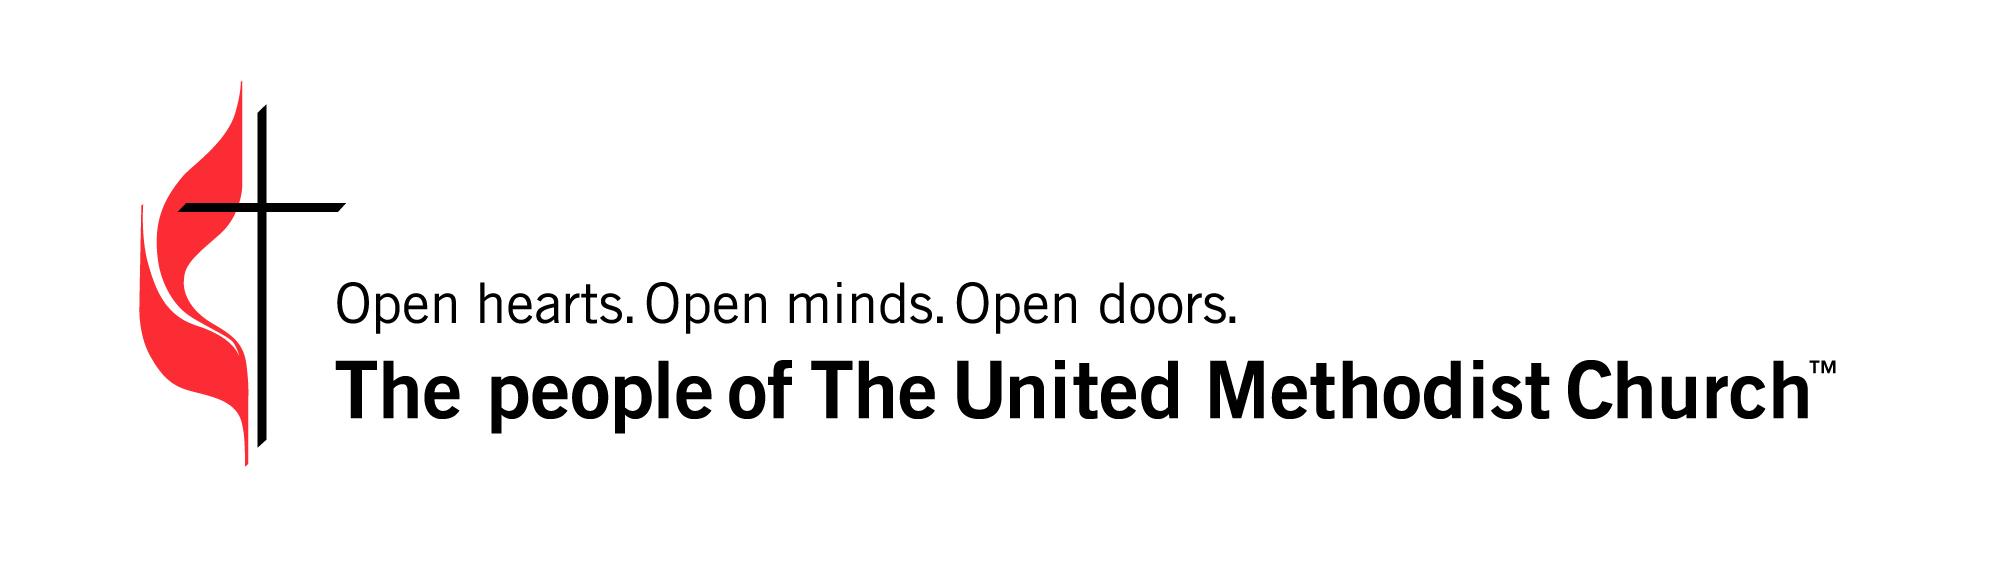 open_hearts_logo